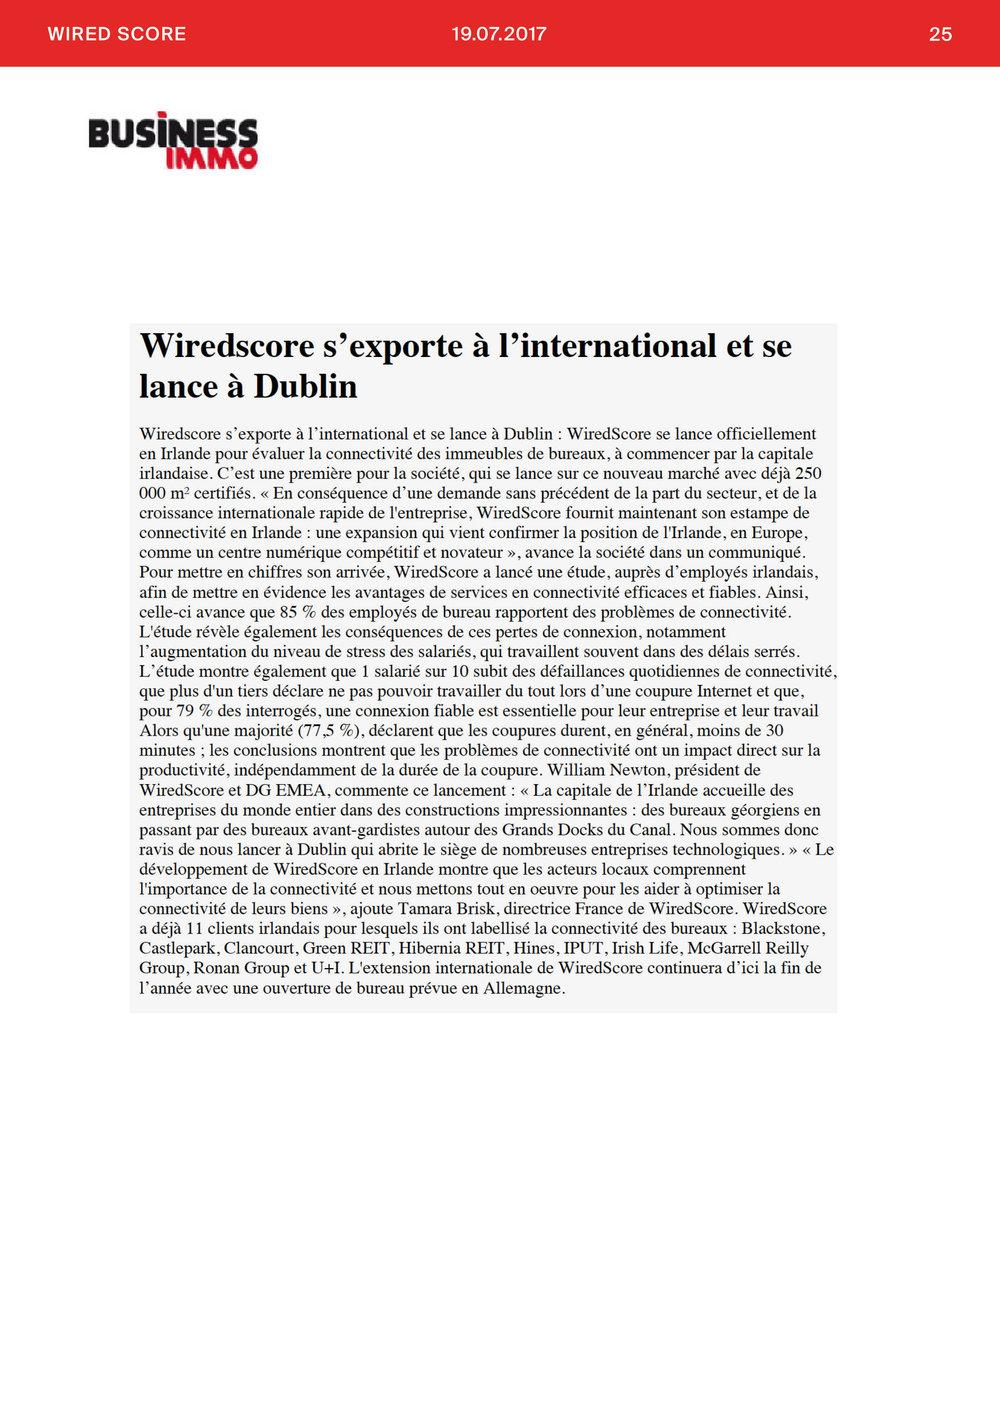 BOOKMEDIA_JUILLET_025.jpg